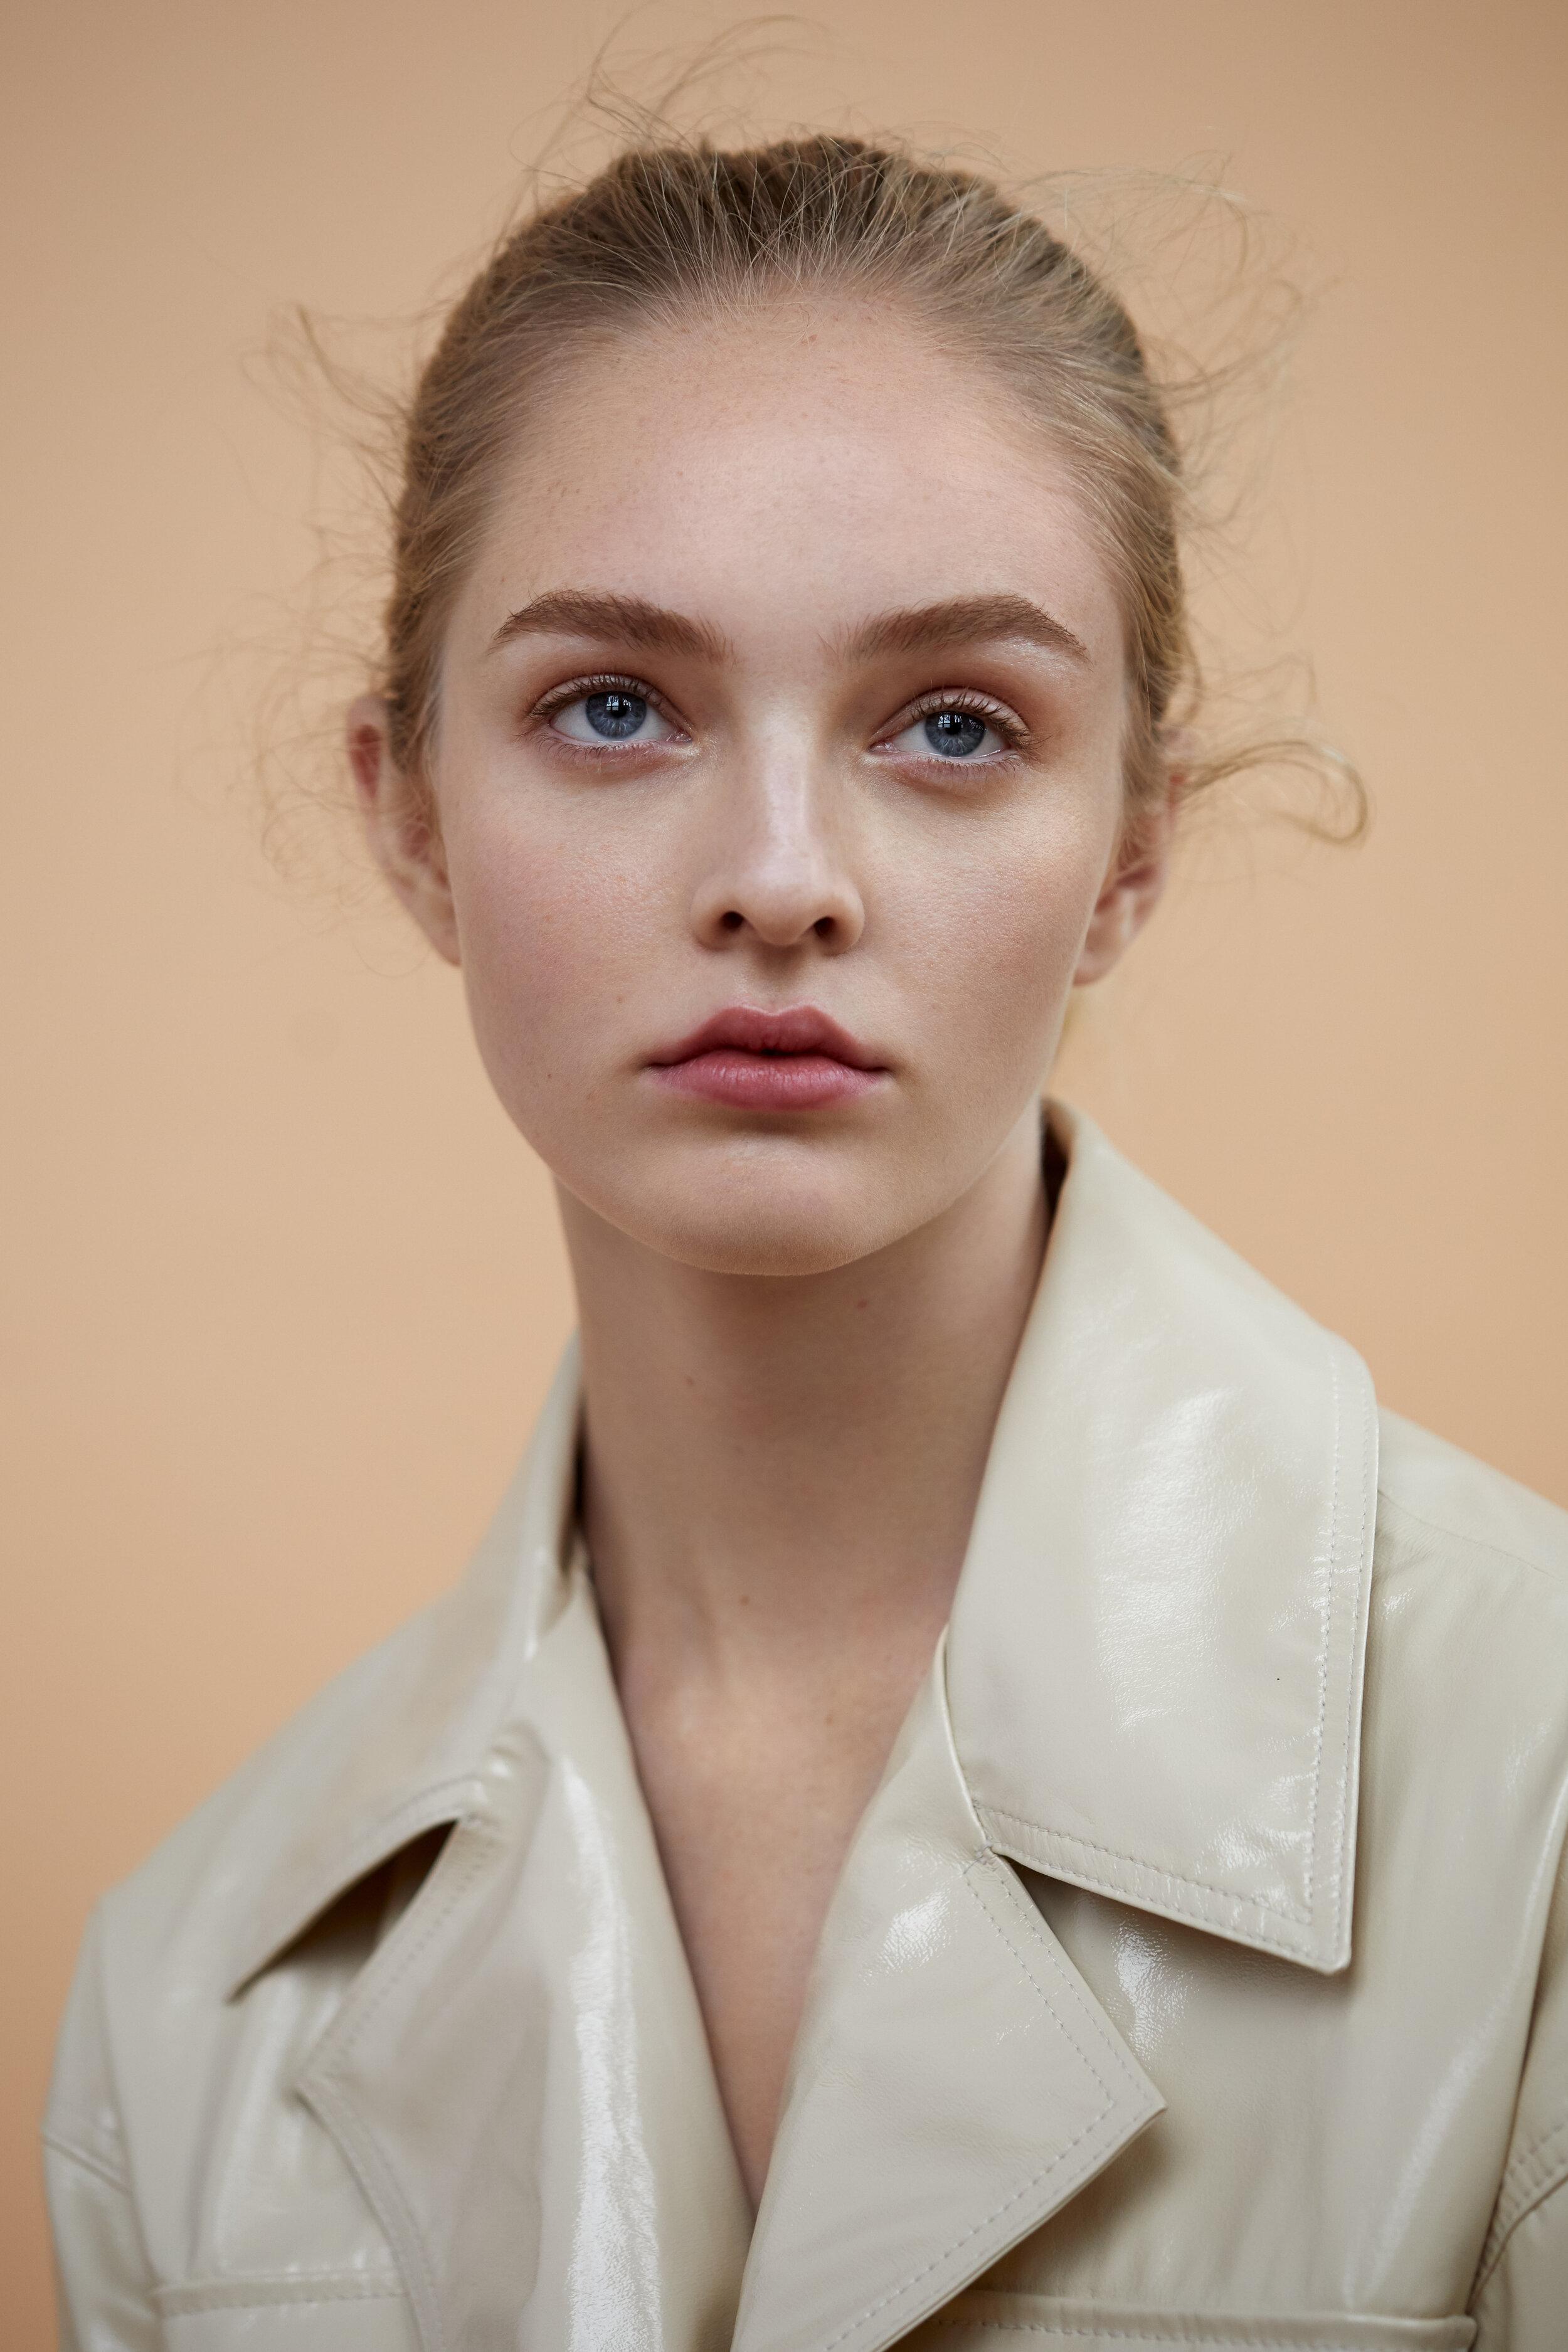 Olivia_Hamilton_New_York_Models_Mikaela_Gauer_Alina_Friesen_Justine_Sweetman.jpg